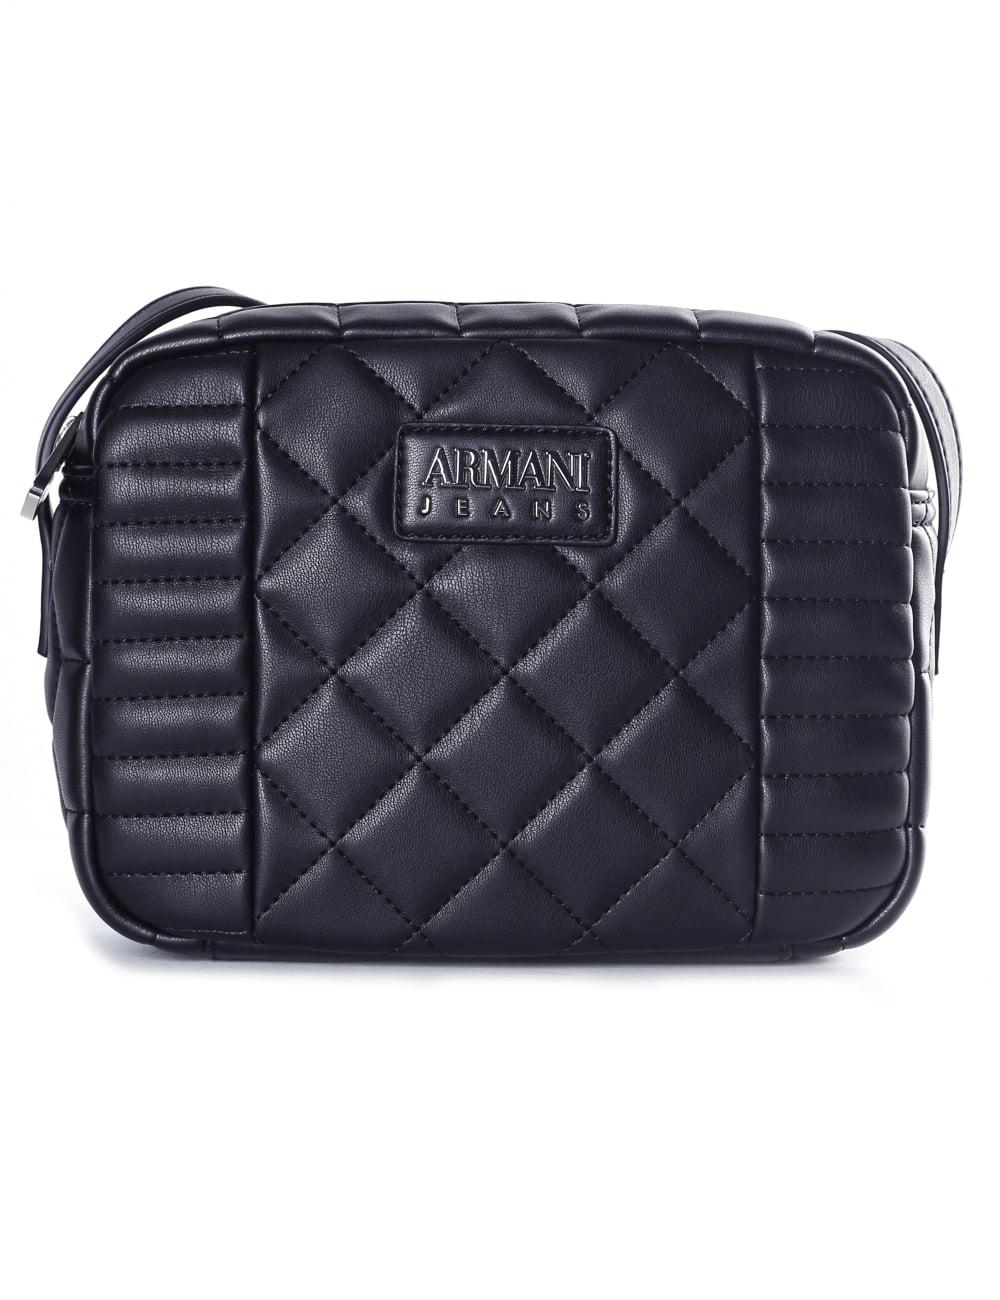 Armani Jeans Women s Crossbody Sling Bag 72713657c9763